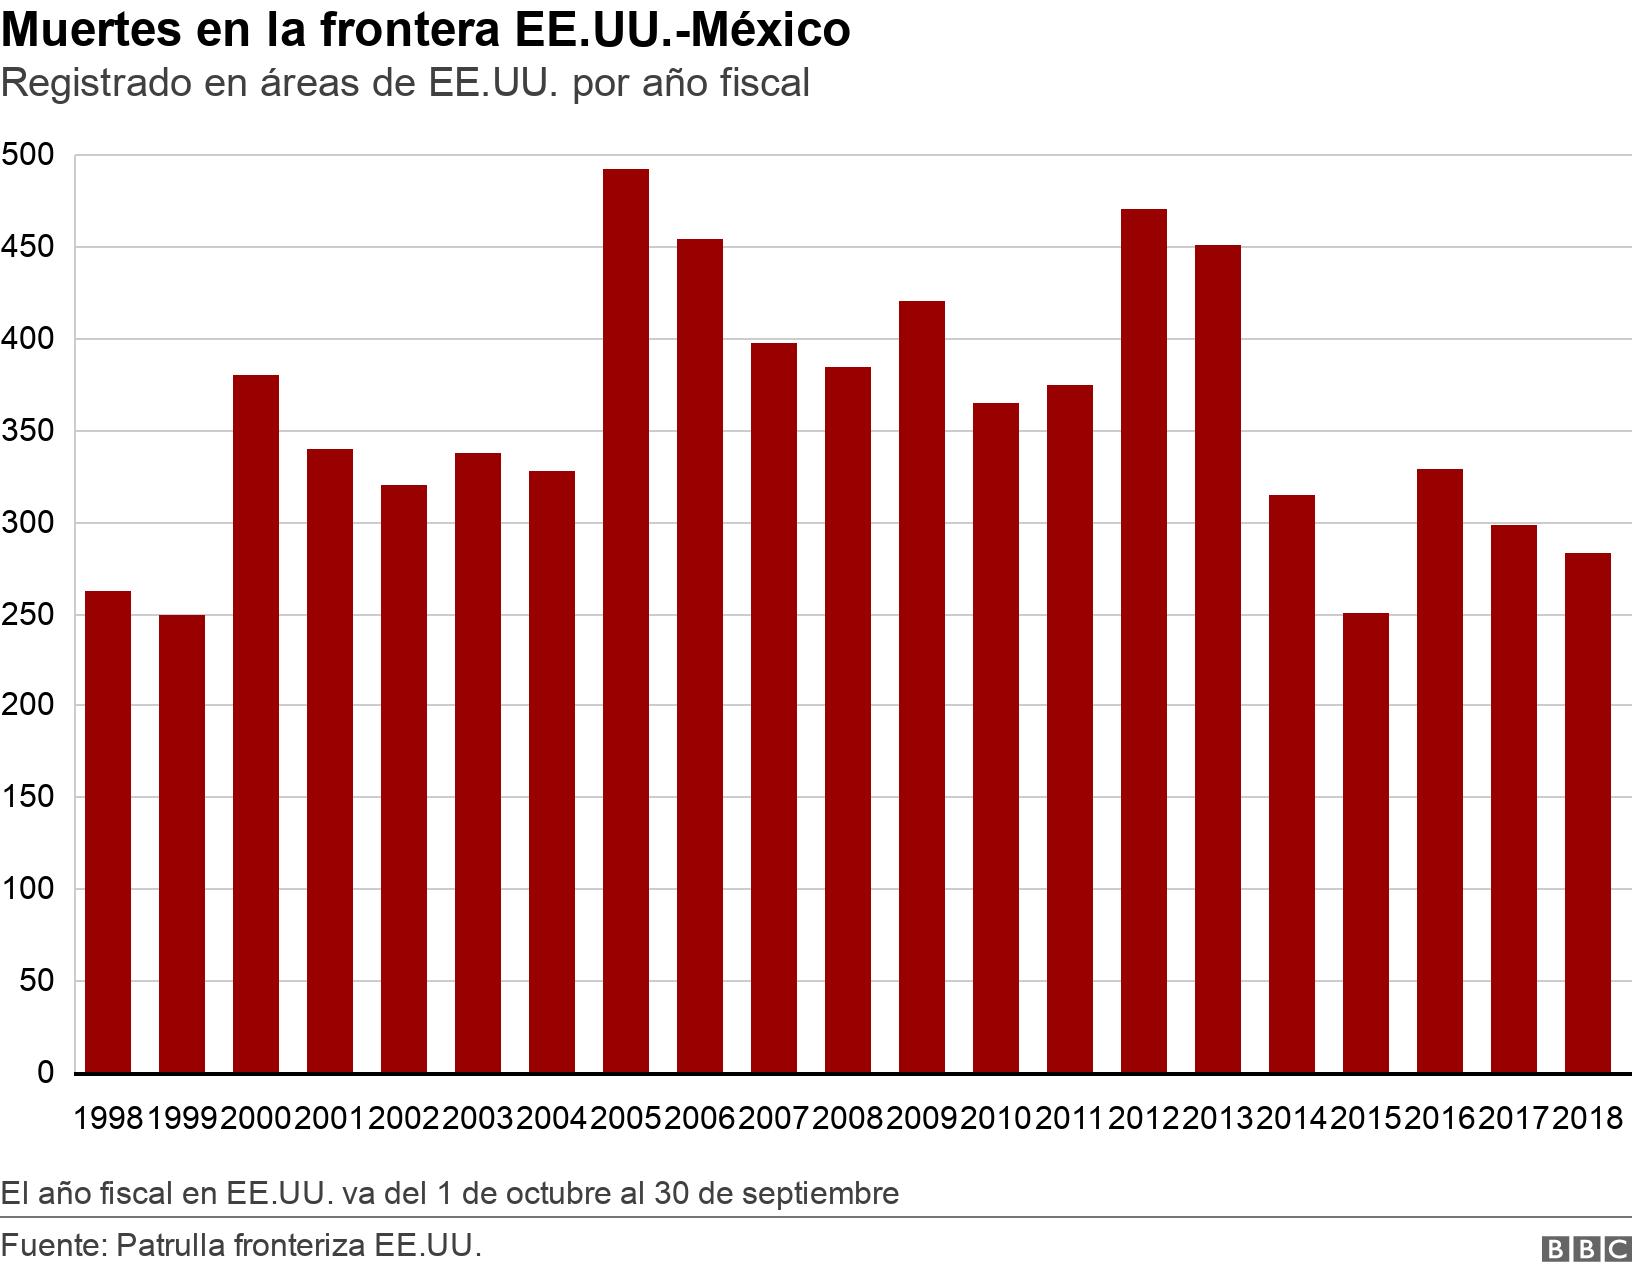 Muertes en la frontera EE.UU.-México.  Registrado en áreas de EE.UU. por año fiscal. This bar chart shows deaths on the US border from 19998 to 2018. The broad shape goes from approx 250 in 1998 to close to just slgihtly higher in 2018, but with a surge in the middle and erratic peaks El año fiscal en EE.UU. va del 1 de octubre al 30 de septiembre.